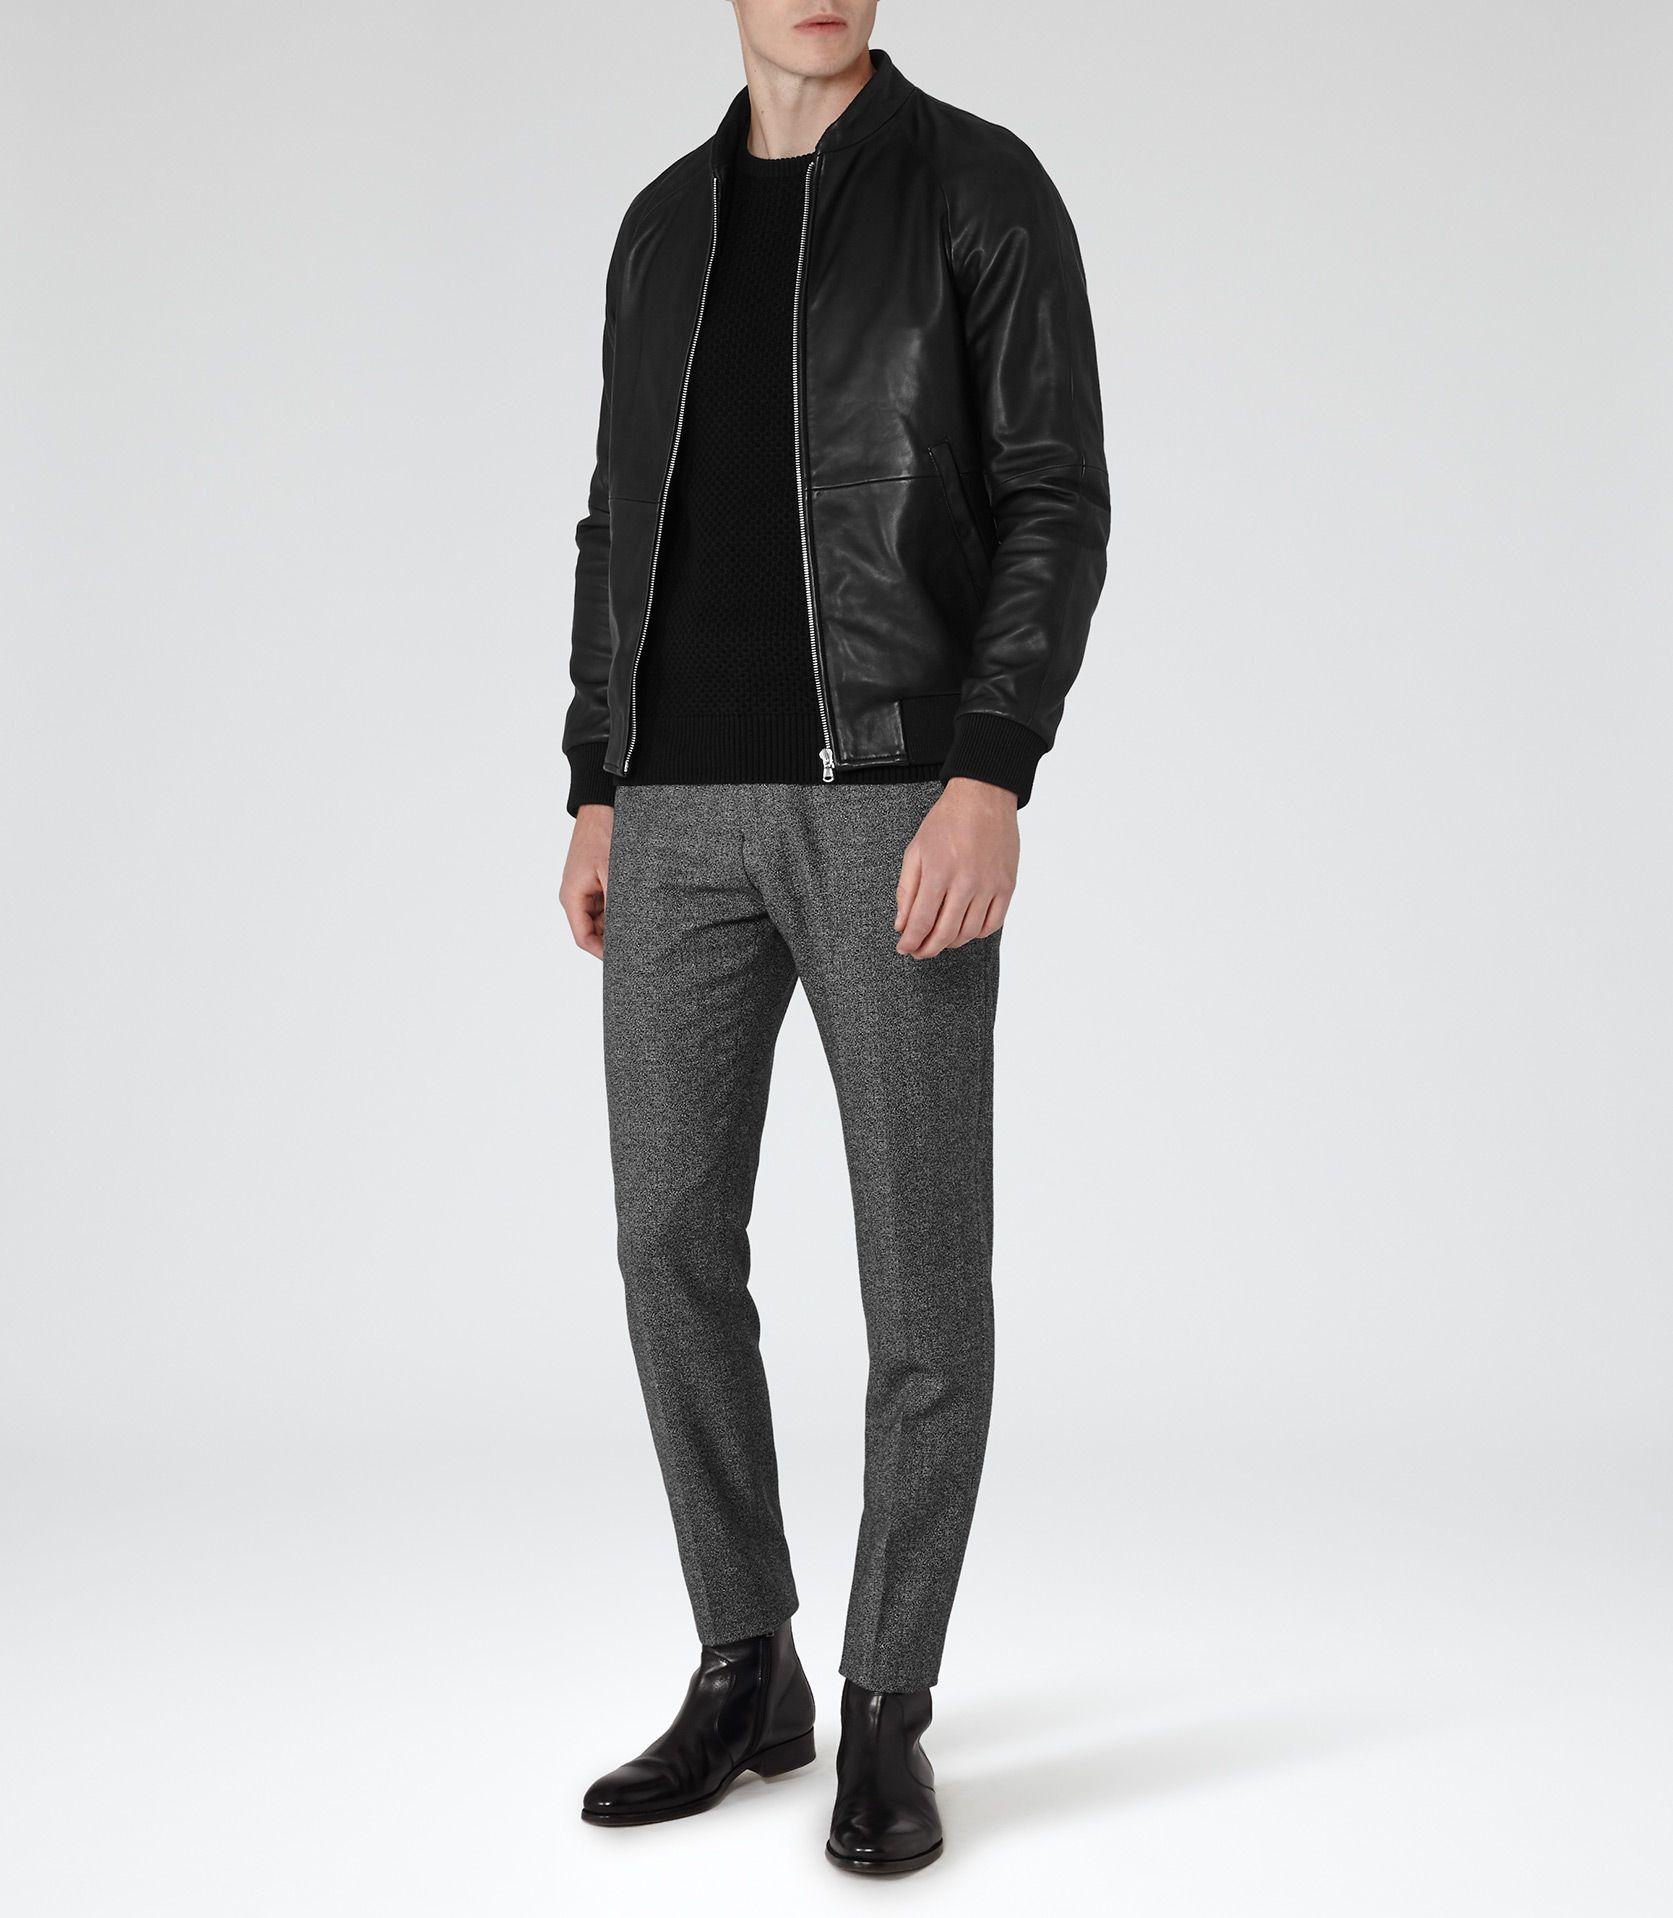 6c3273dc7 Mens Black Leather Bomber Jacket - Reiss Kent   Men's Style   Black ...